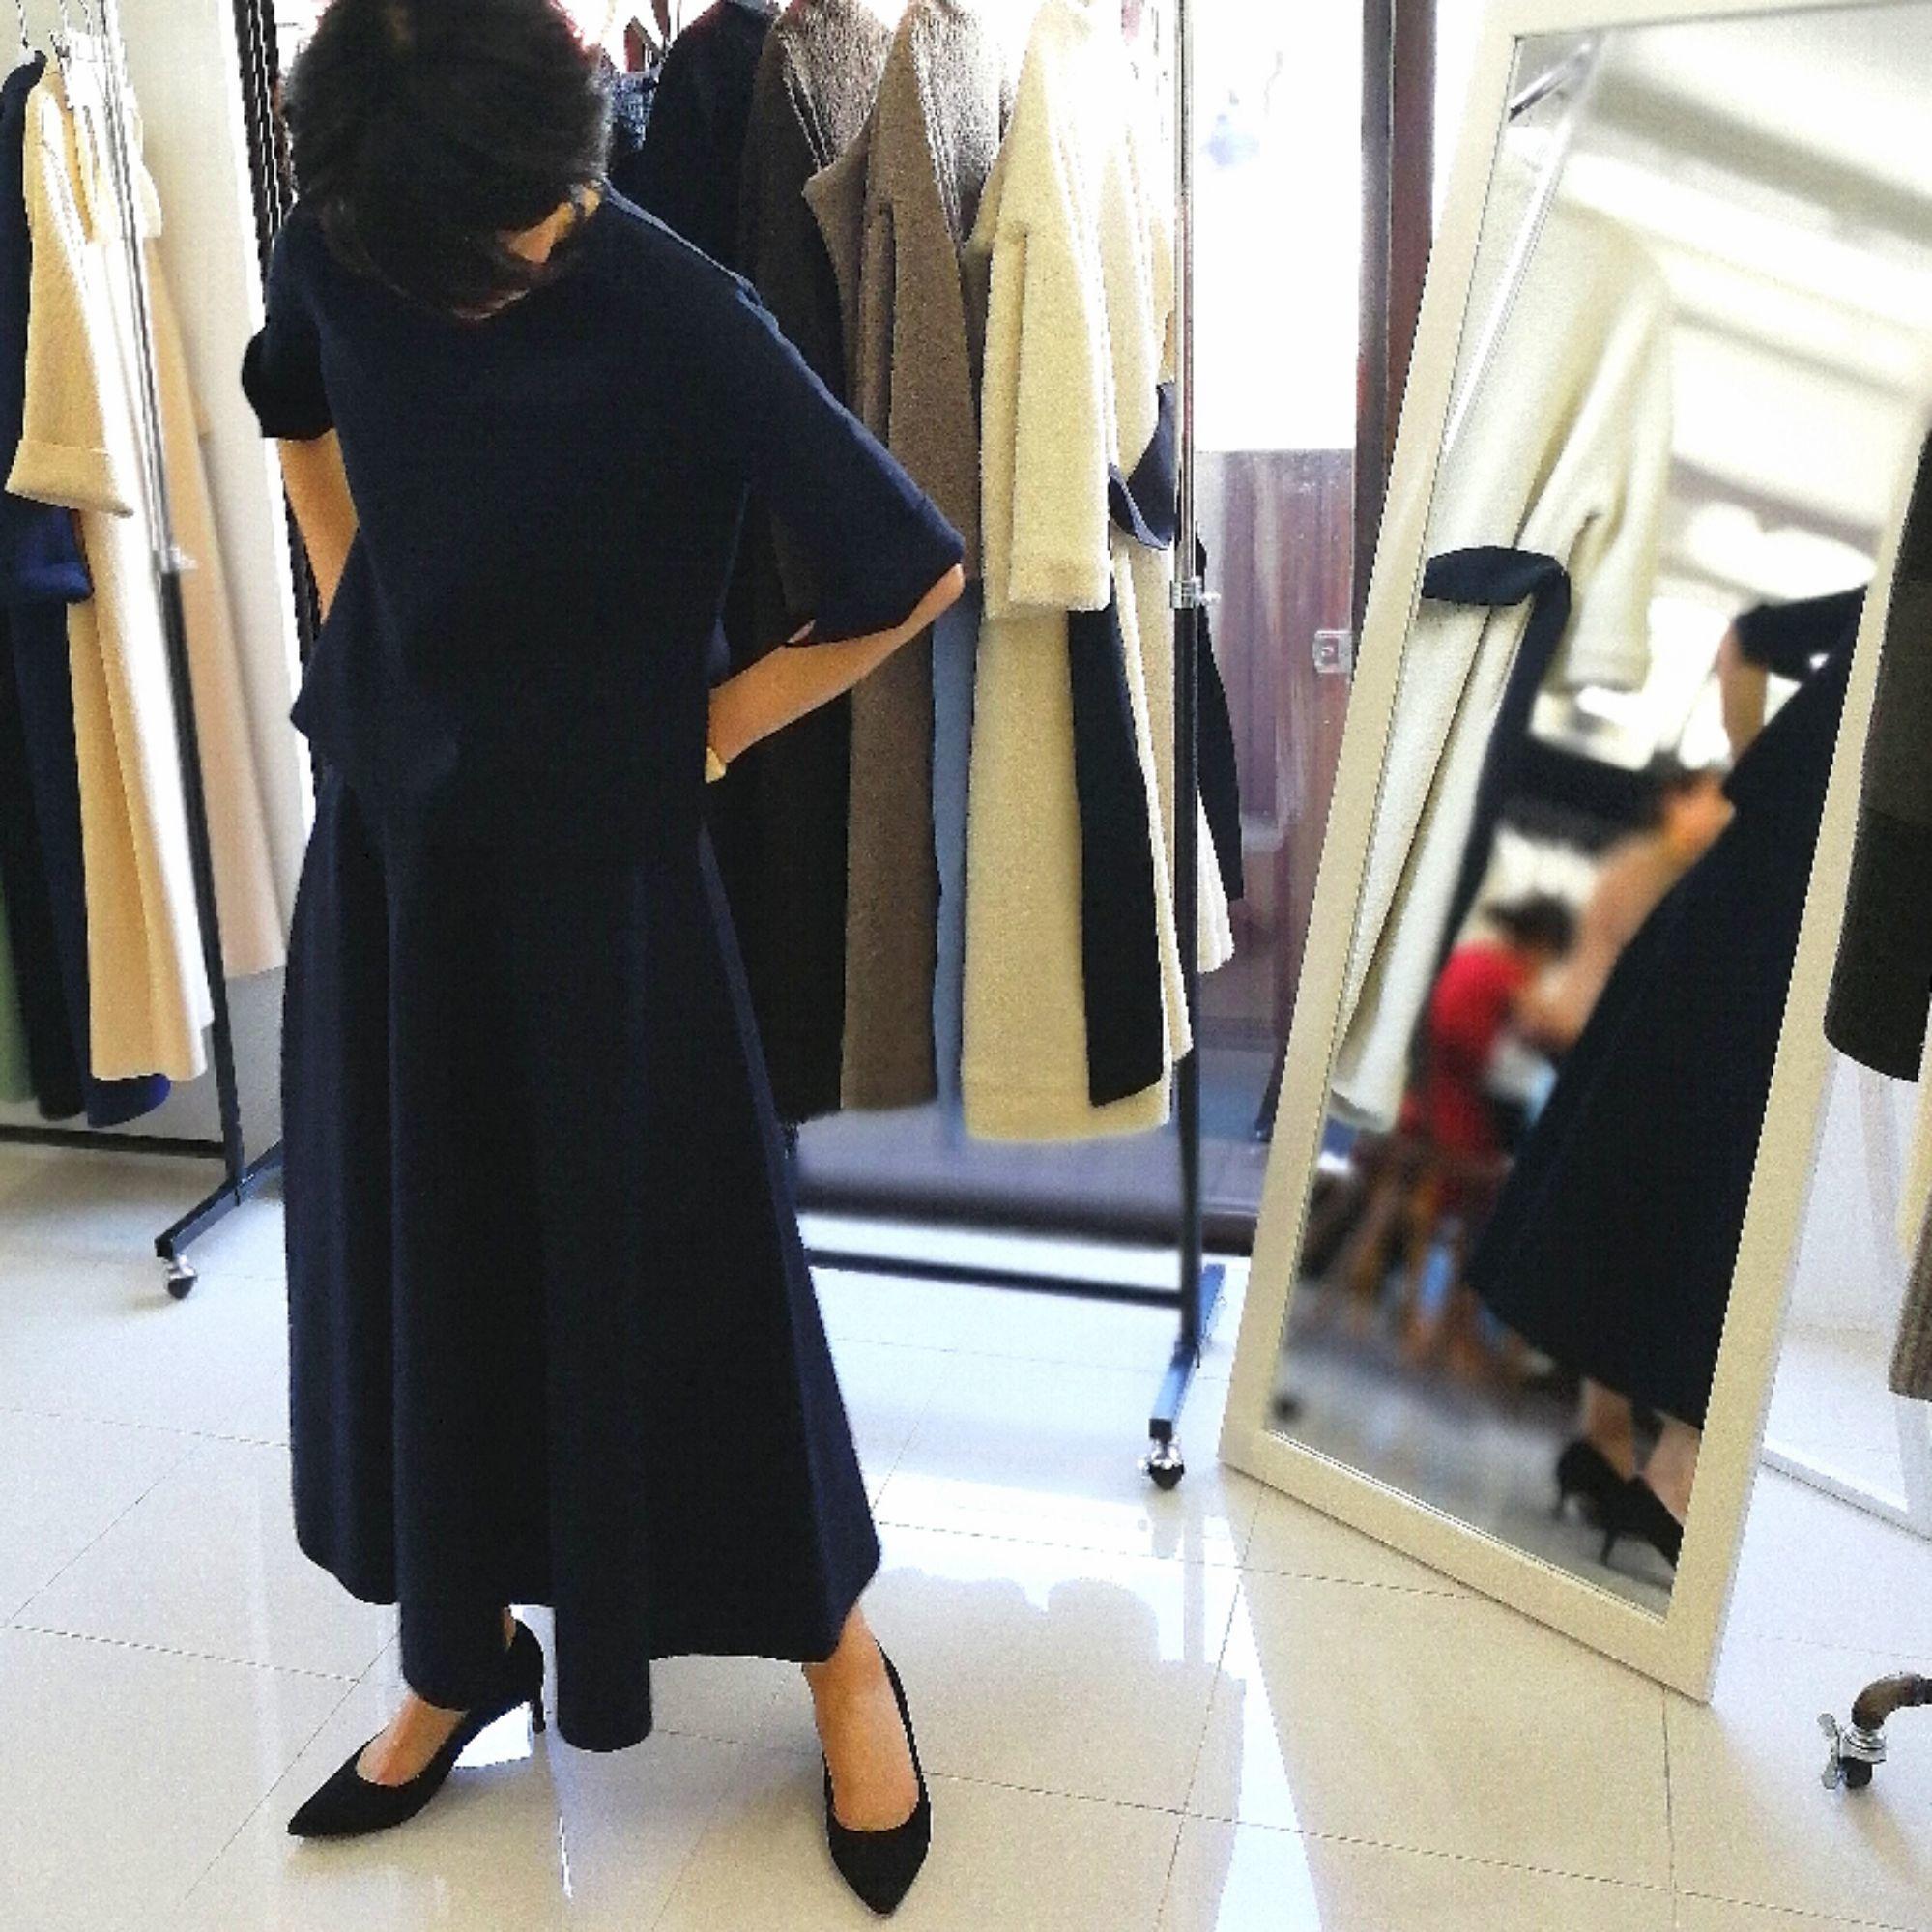 Marisol誌面で一目惚れしたスカートを求めて_1_1-4